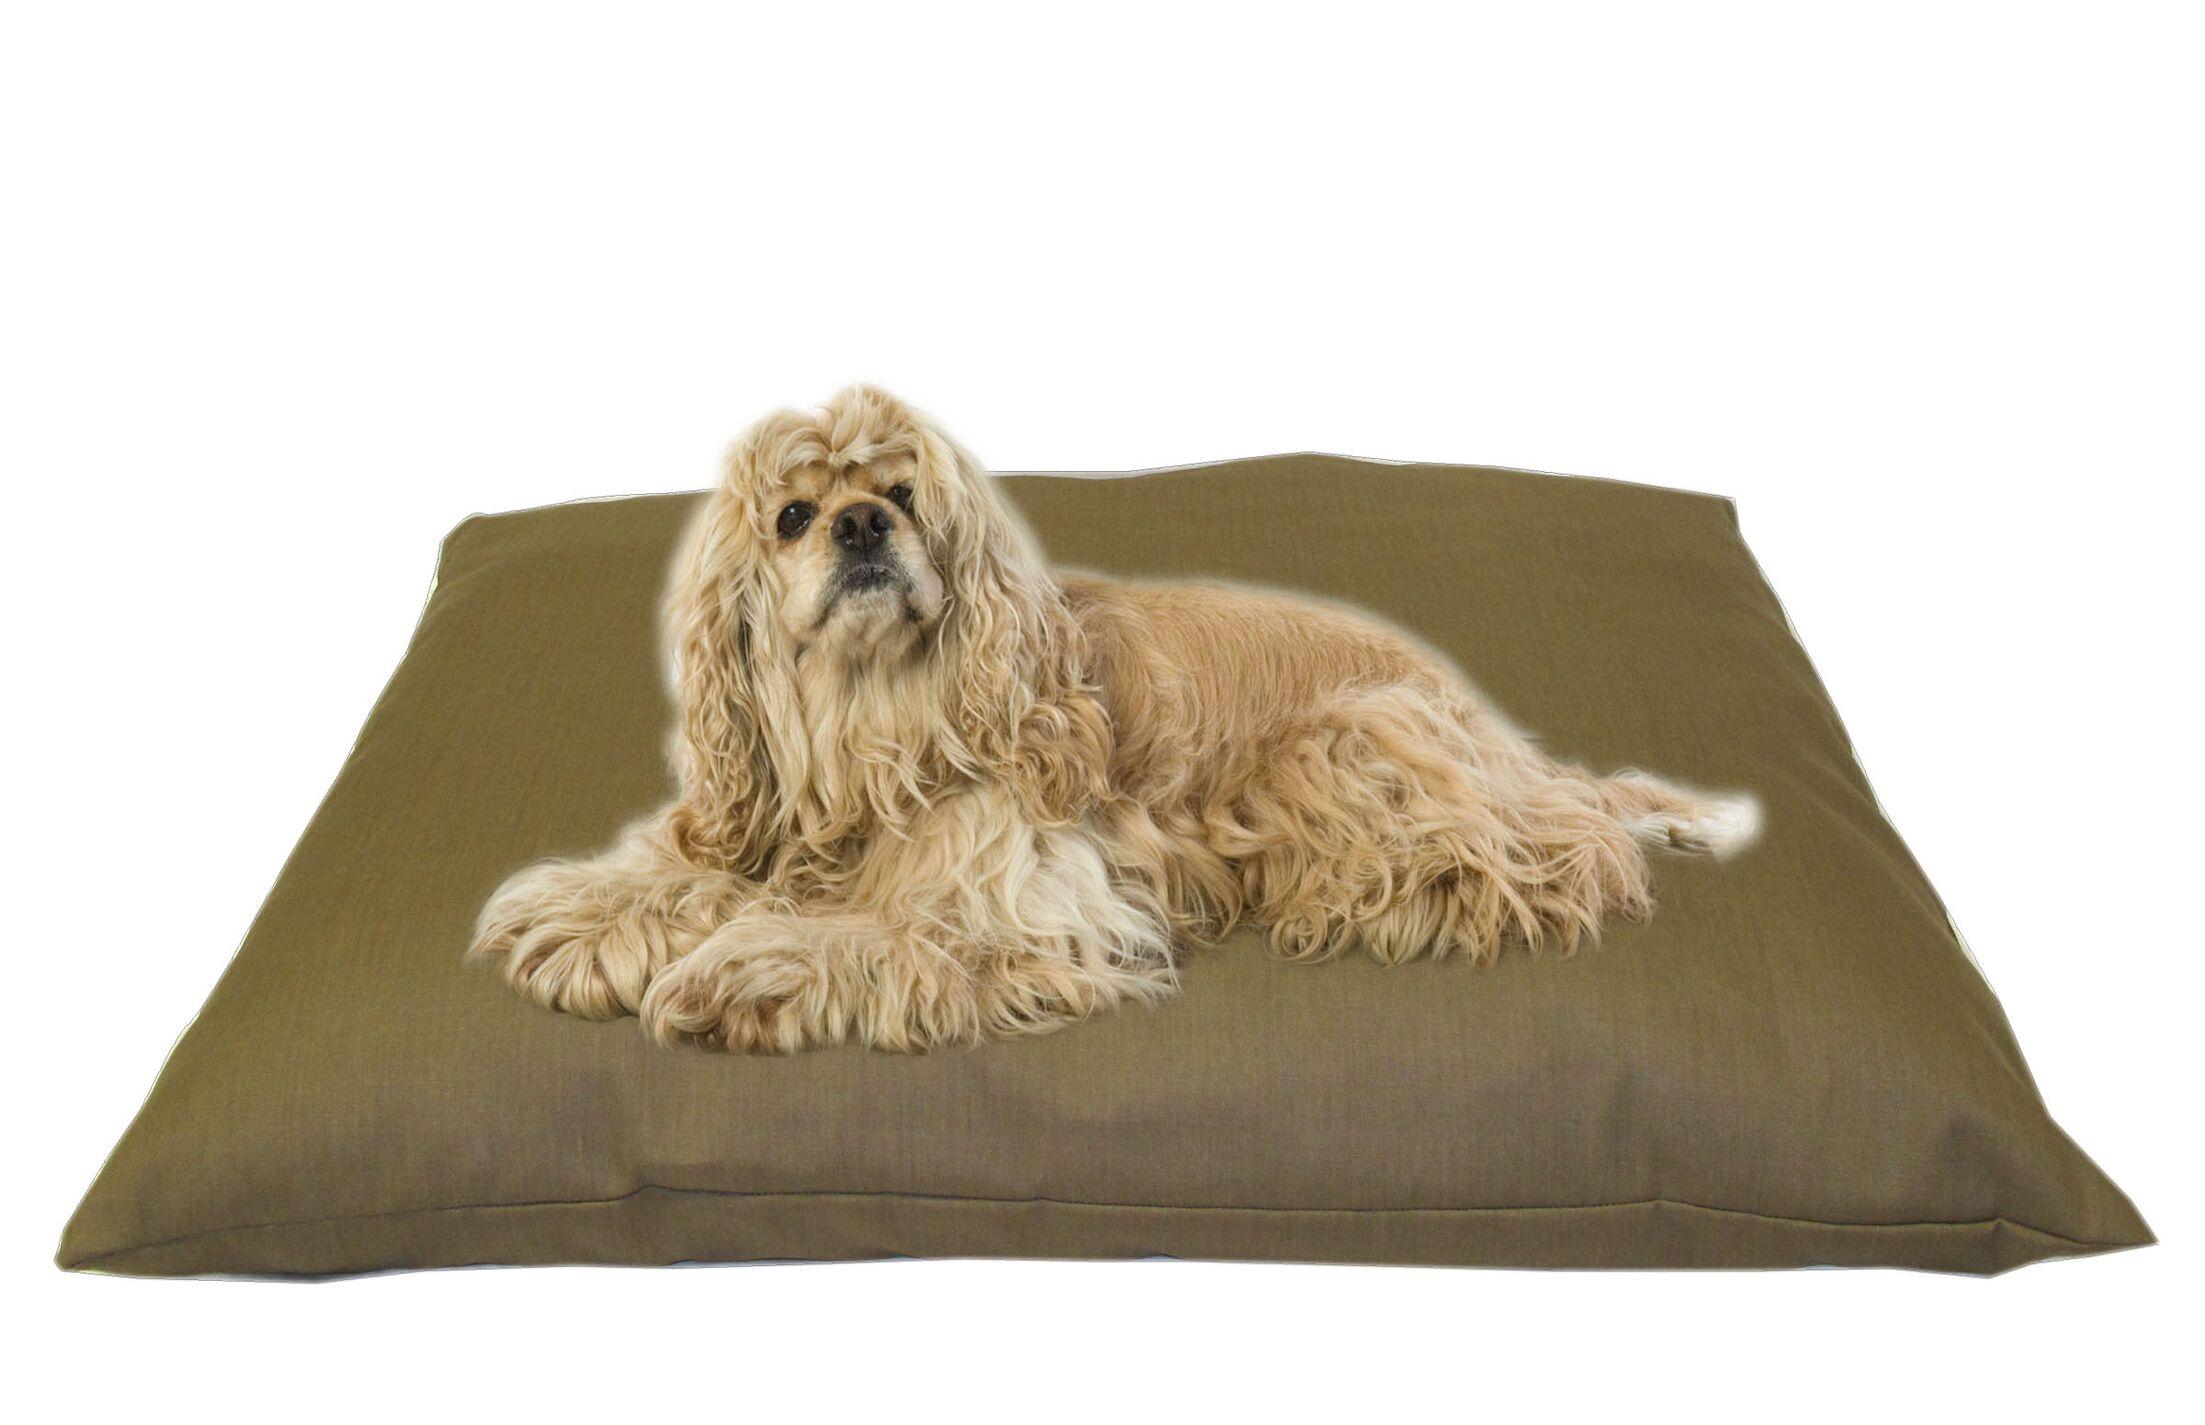 Cricket Indoor/Outdoor Shegang Dog Bed in Solid Tan Size: Medium